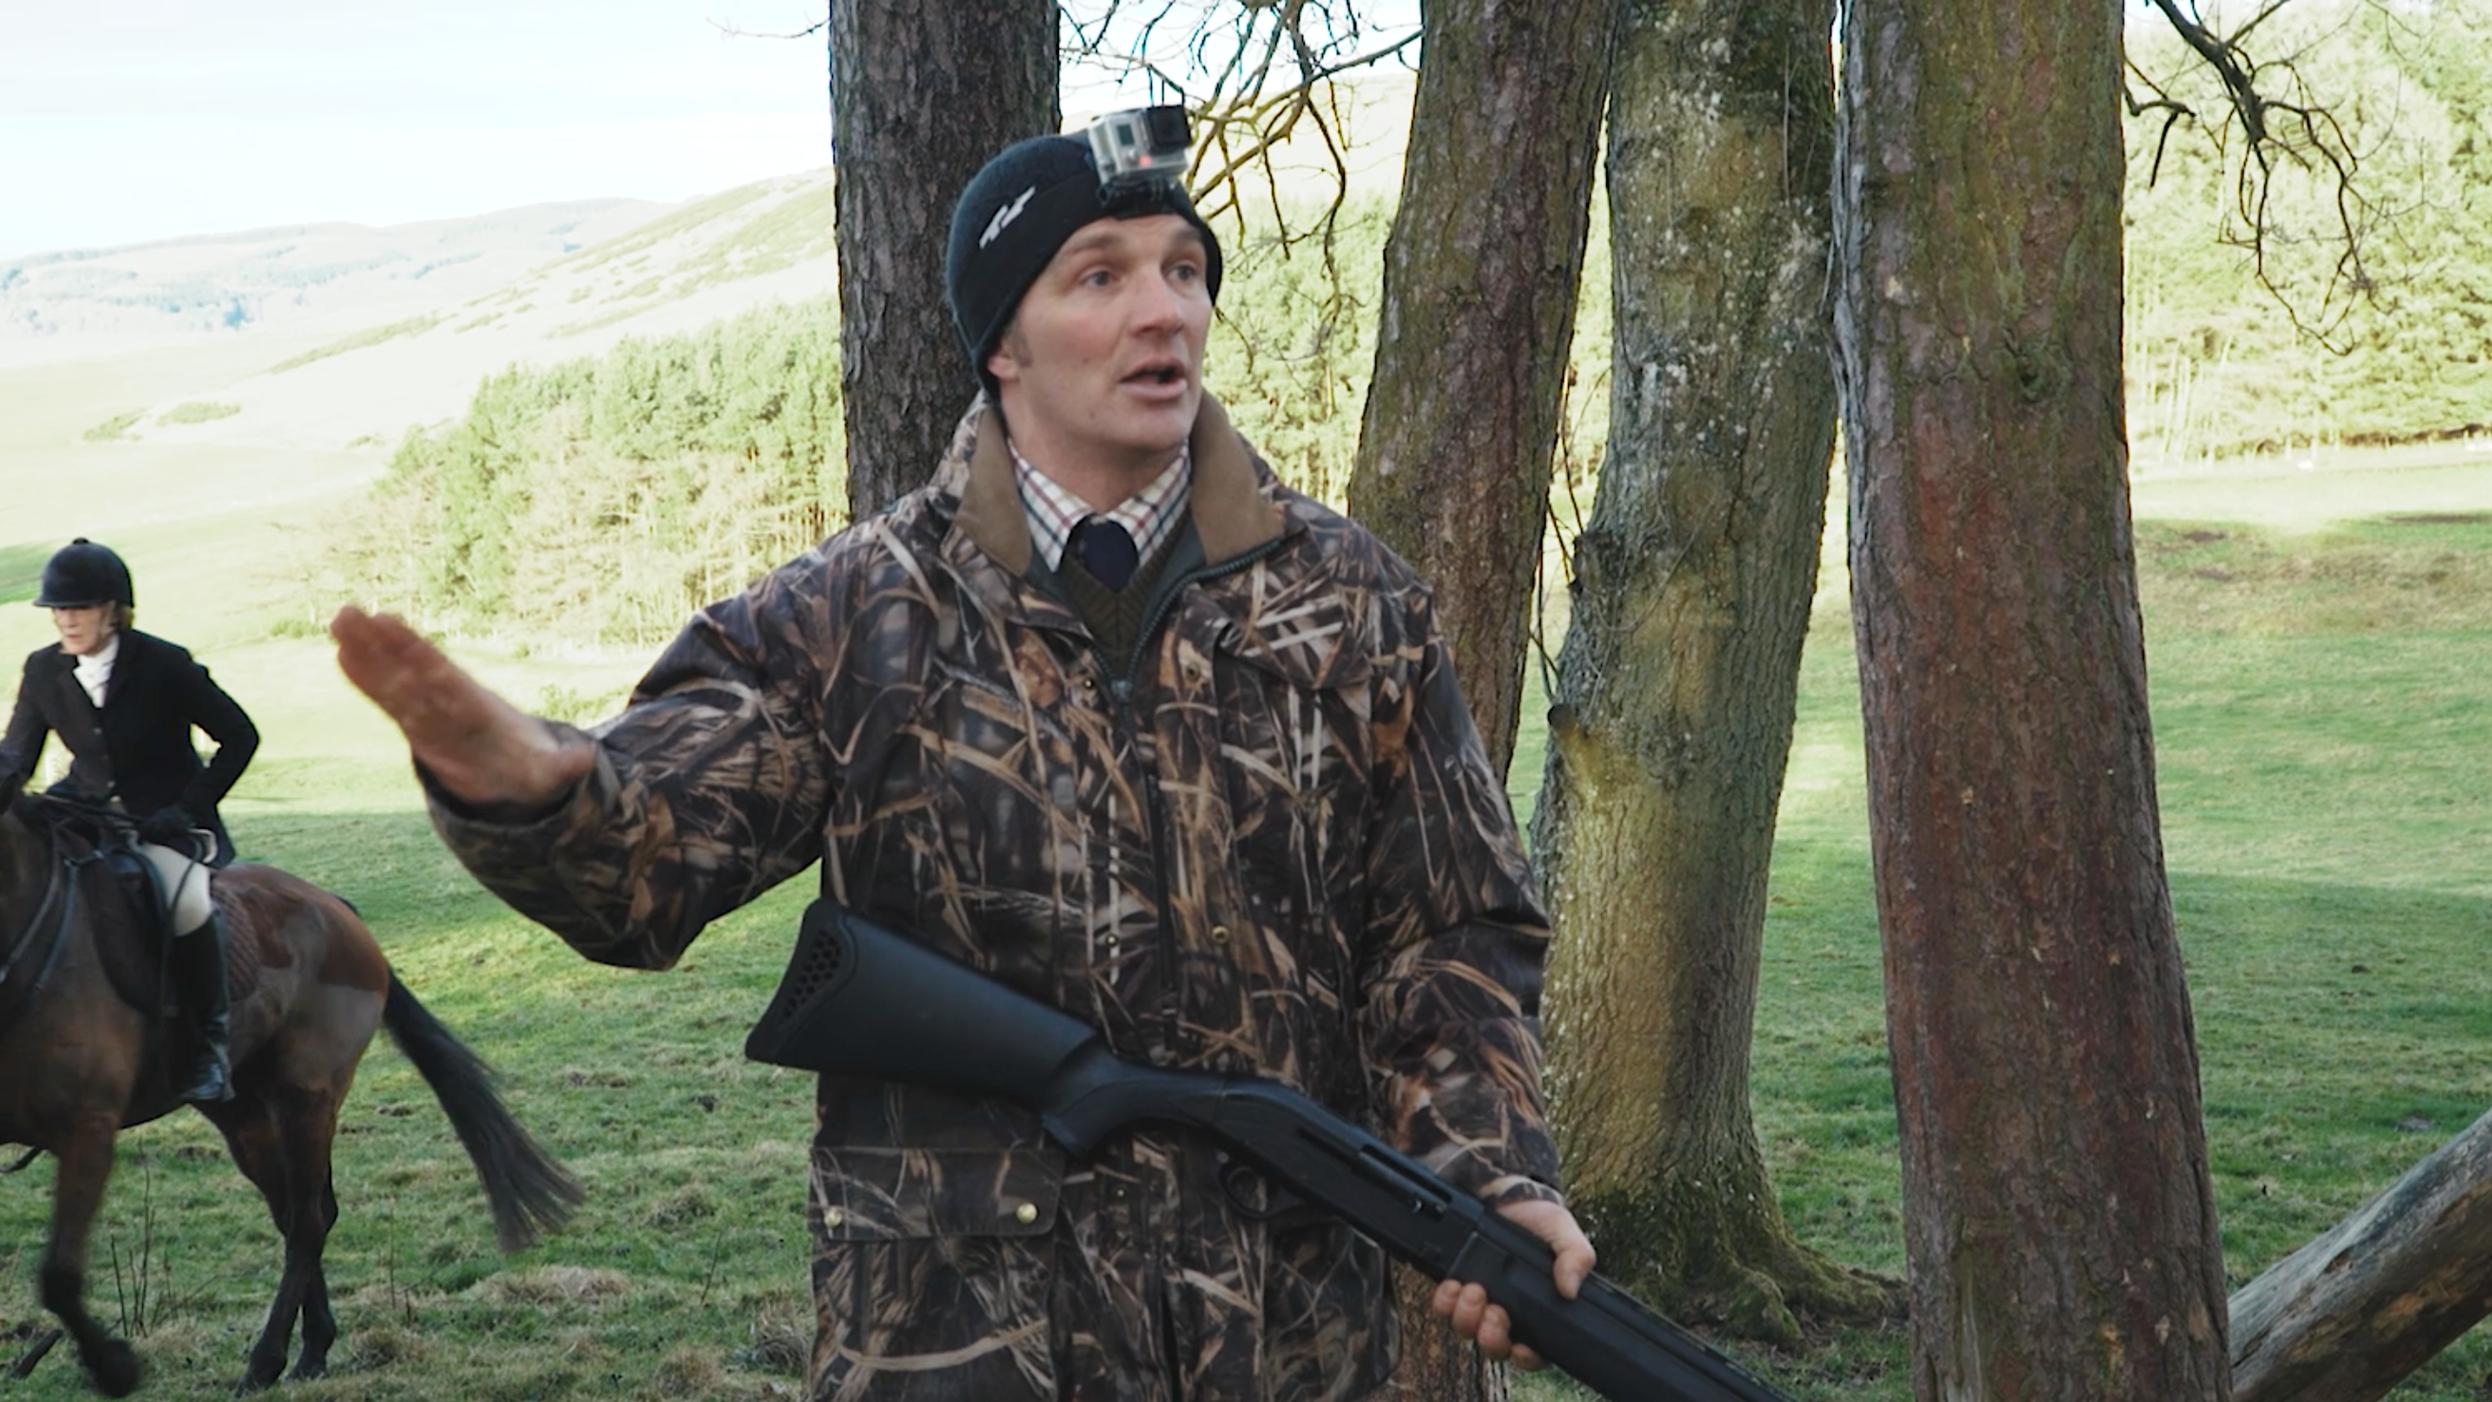 The Hunt - Documentary